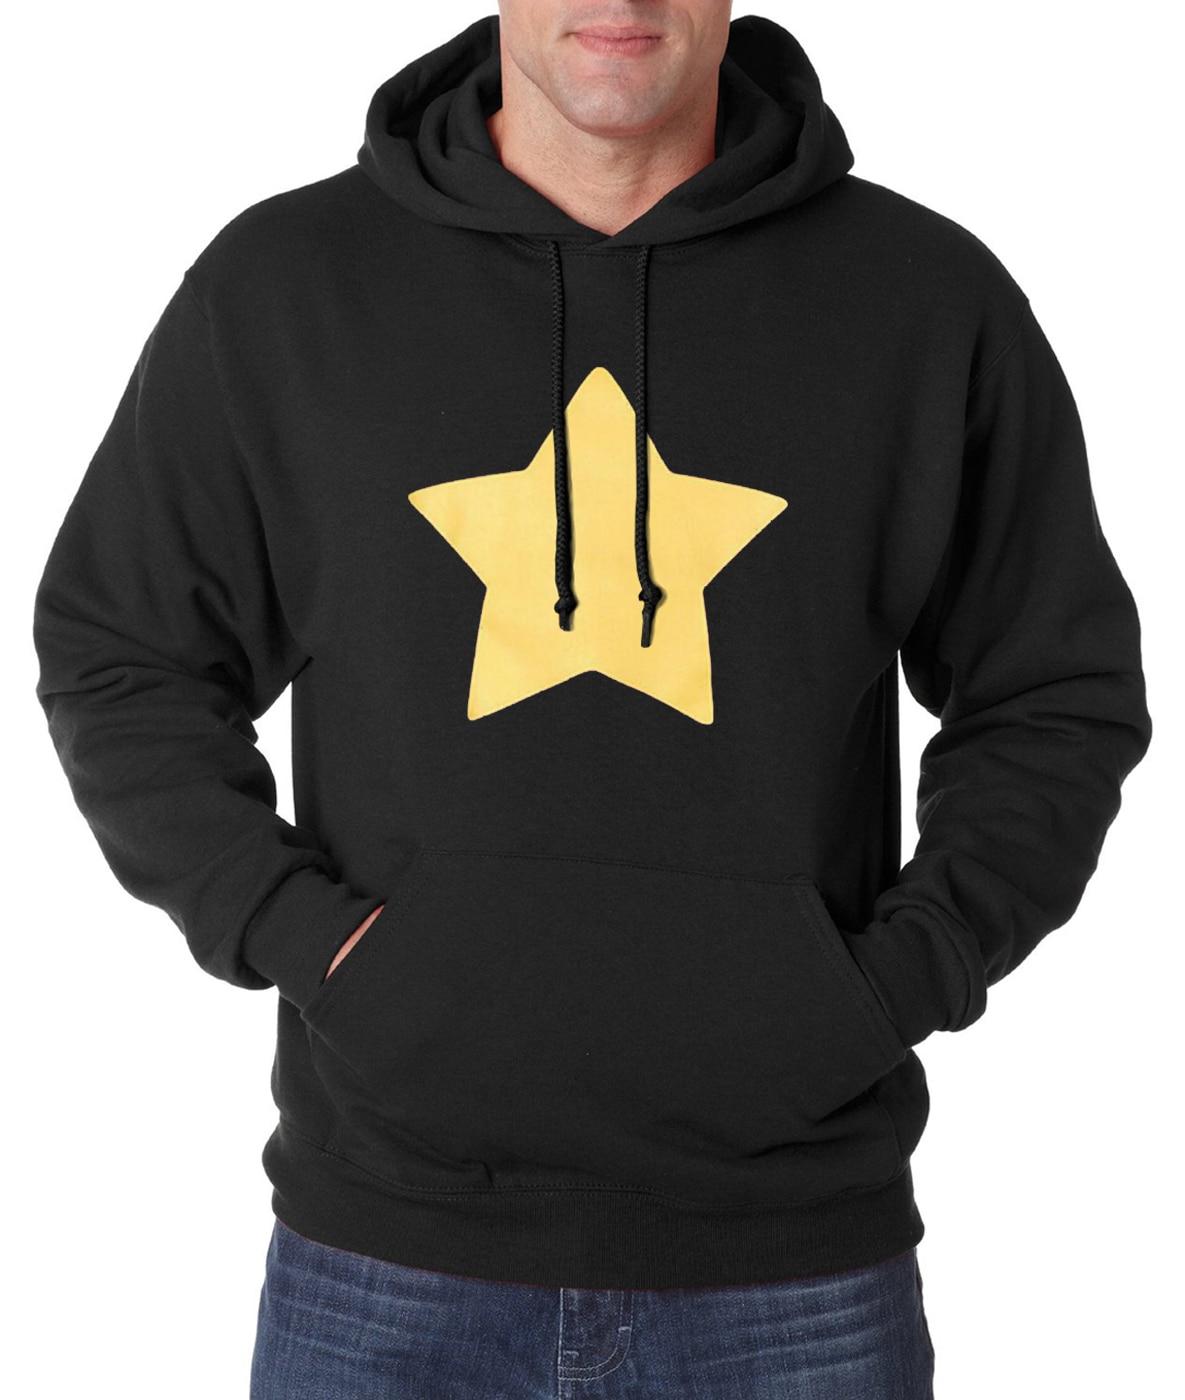 New Arrival 2019 Autumn Winter Steven Universe Star Print Men Sweatshirts Casual Hoodie Men Warm Fleece Slim Fit S-2XL Available